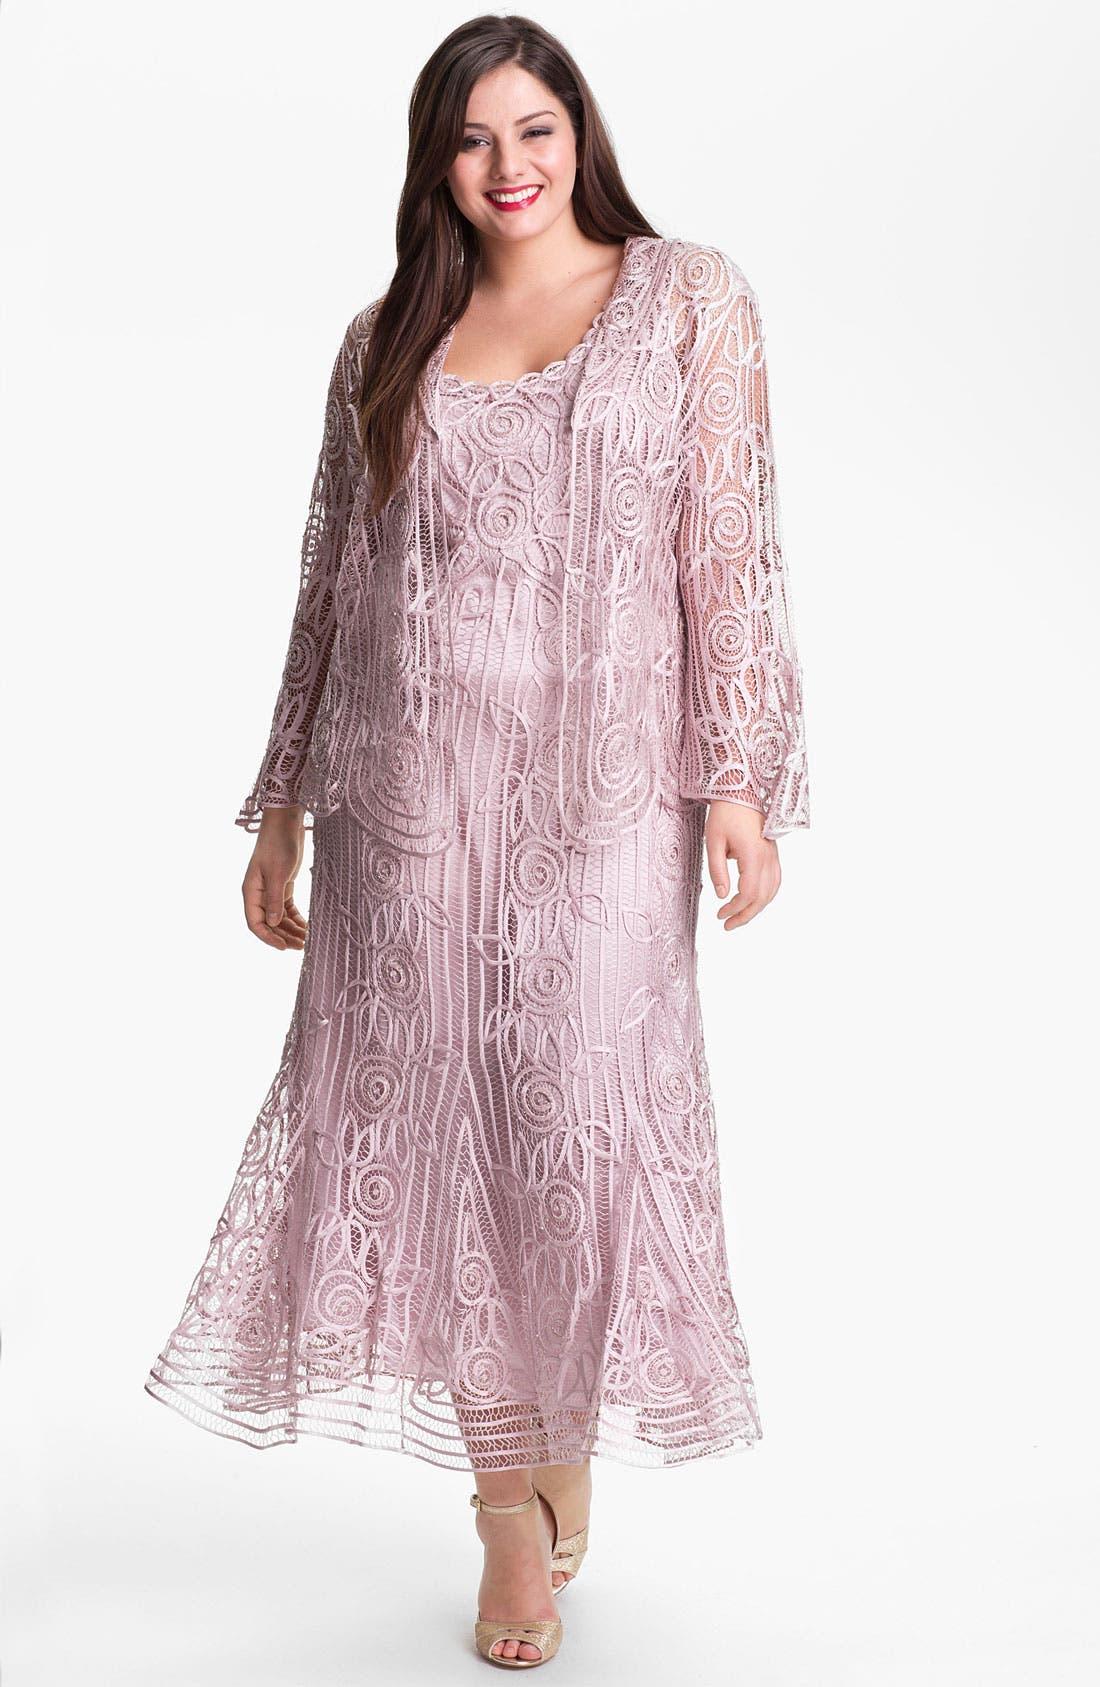 Alternate Image 1 Selected - Soulmates Ribbon Silk Dress & Jacket (Plus Size)